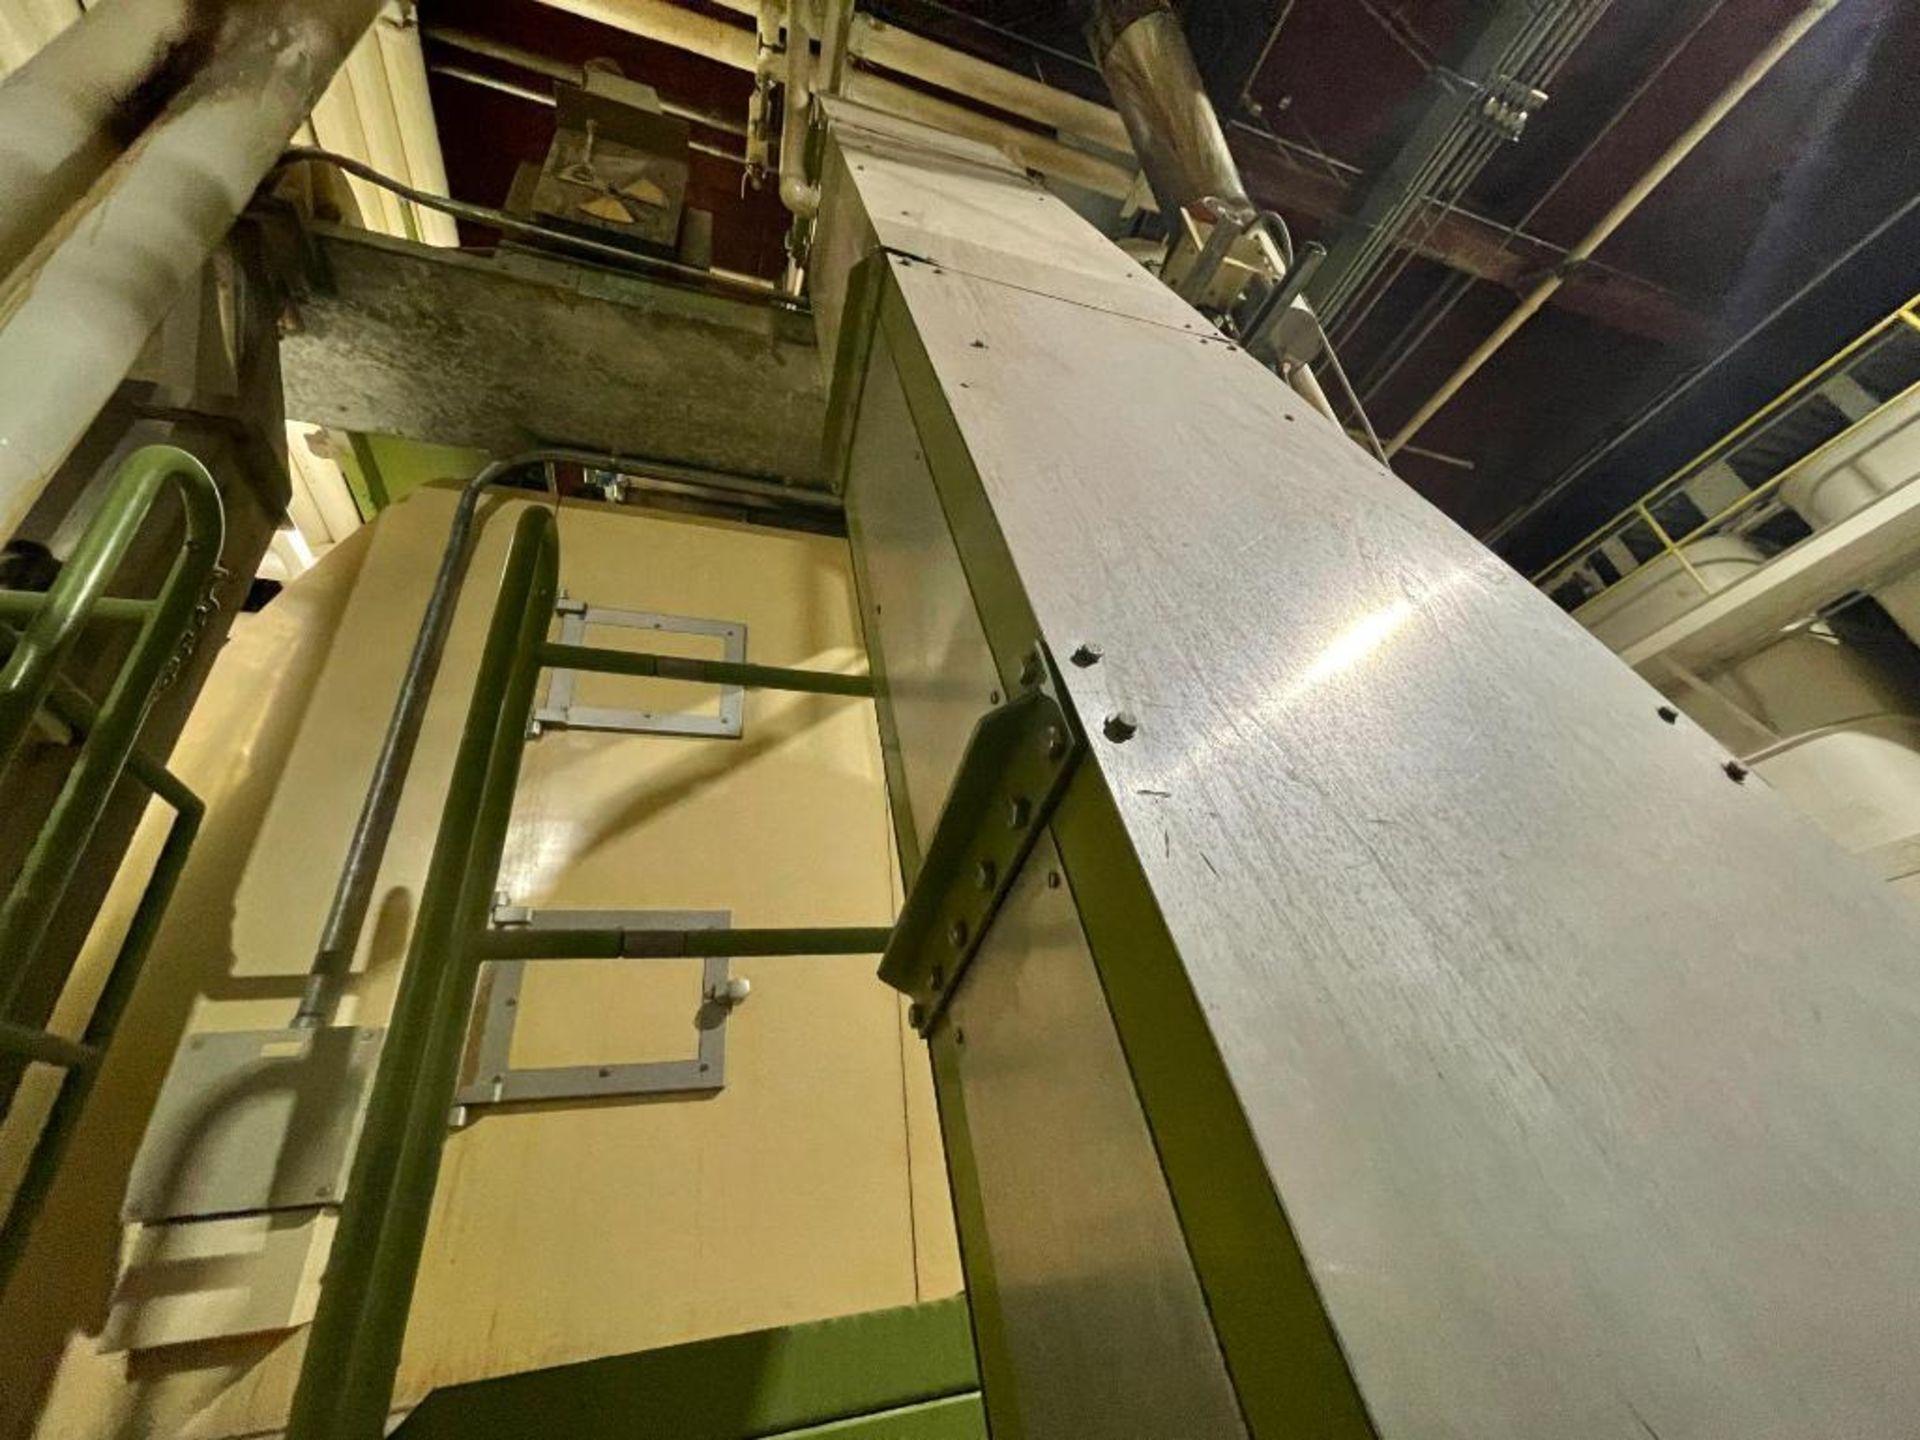 mild steel incline overlapping bucket conveyor - Image 7 of 14